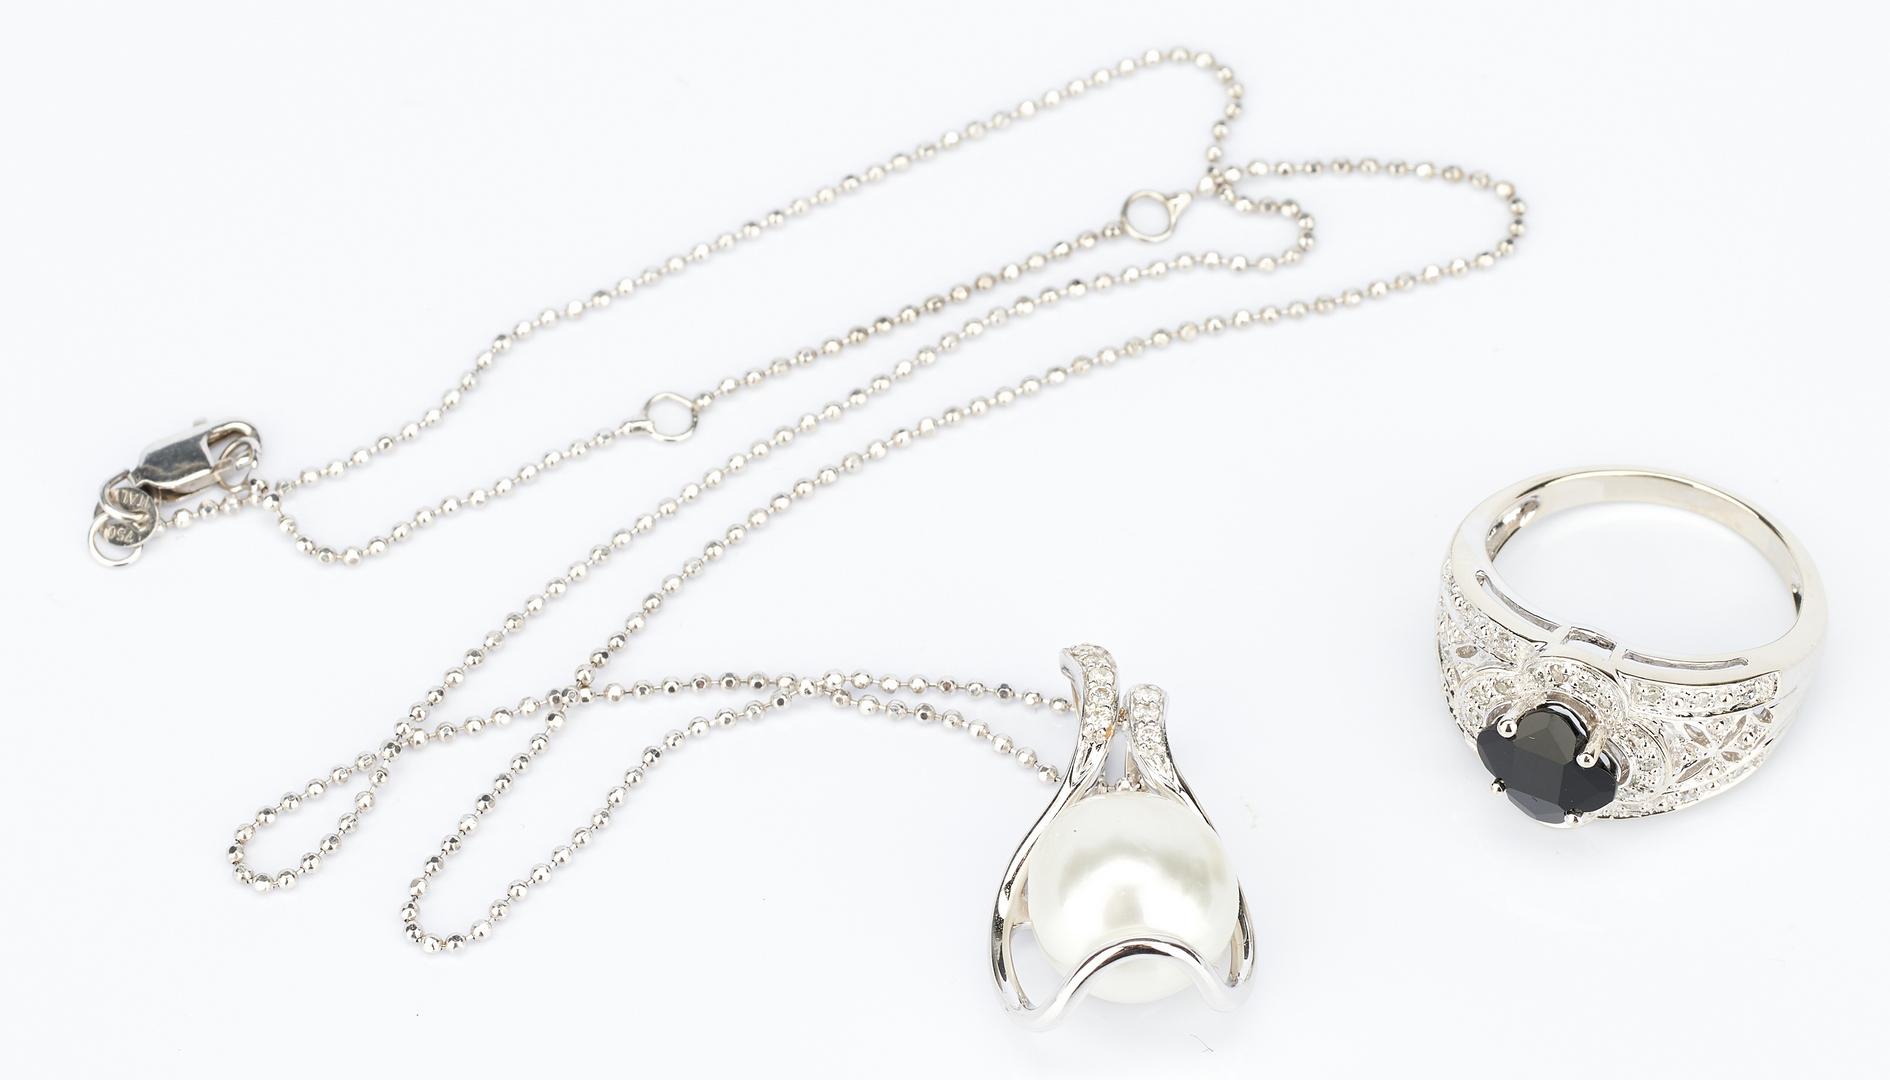 Lot 915: 1 Ladies 14K Onyx and Diamond Ring & 1 Ladies 18K Necklace